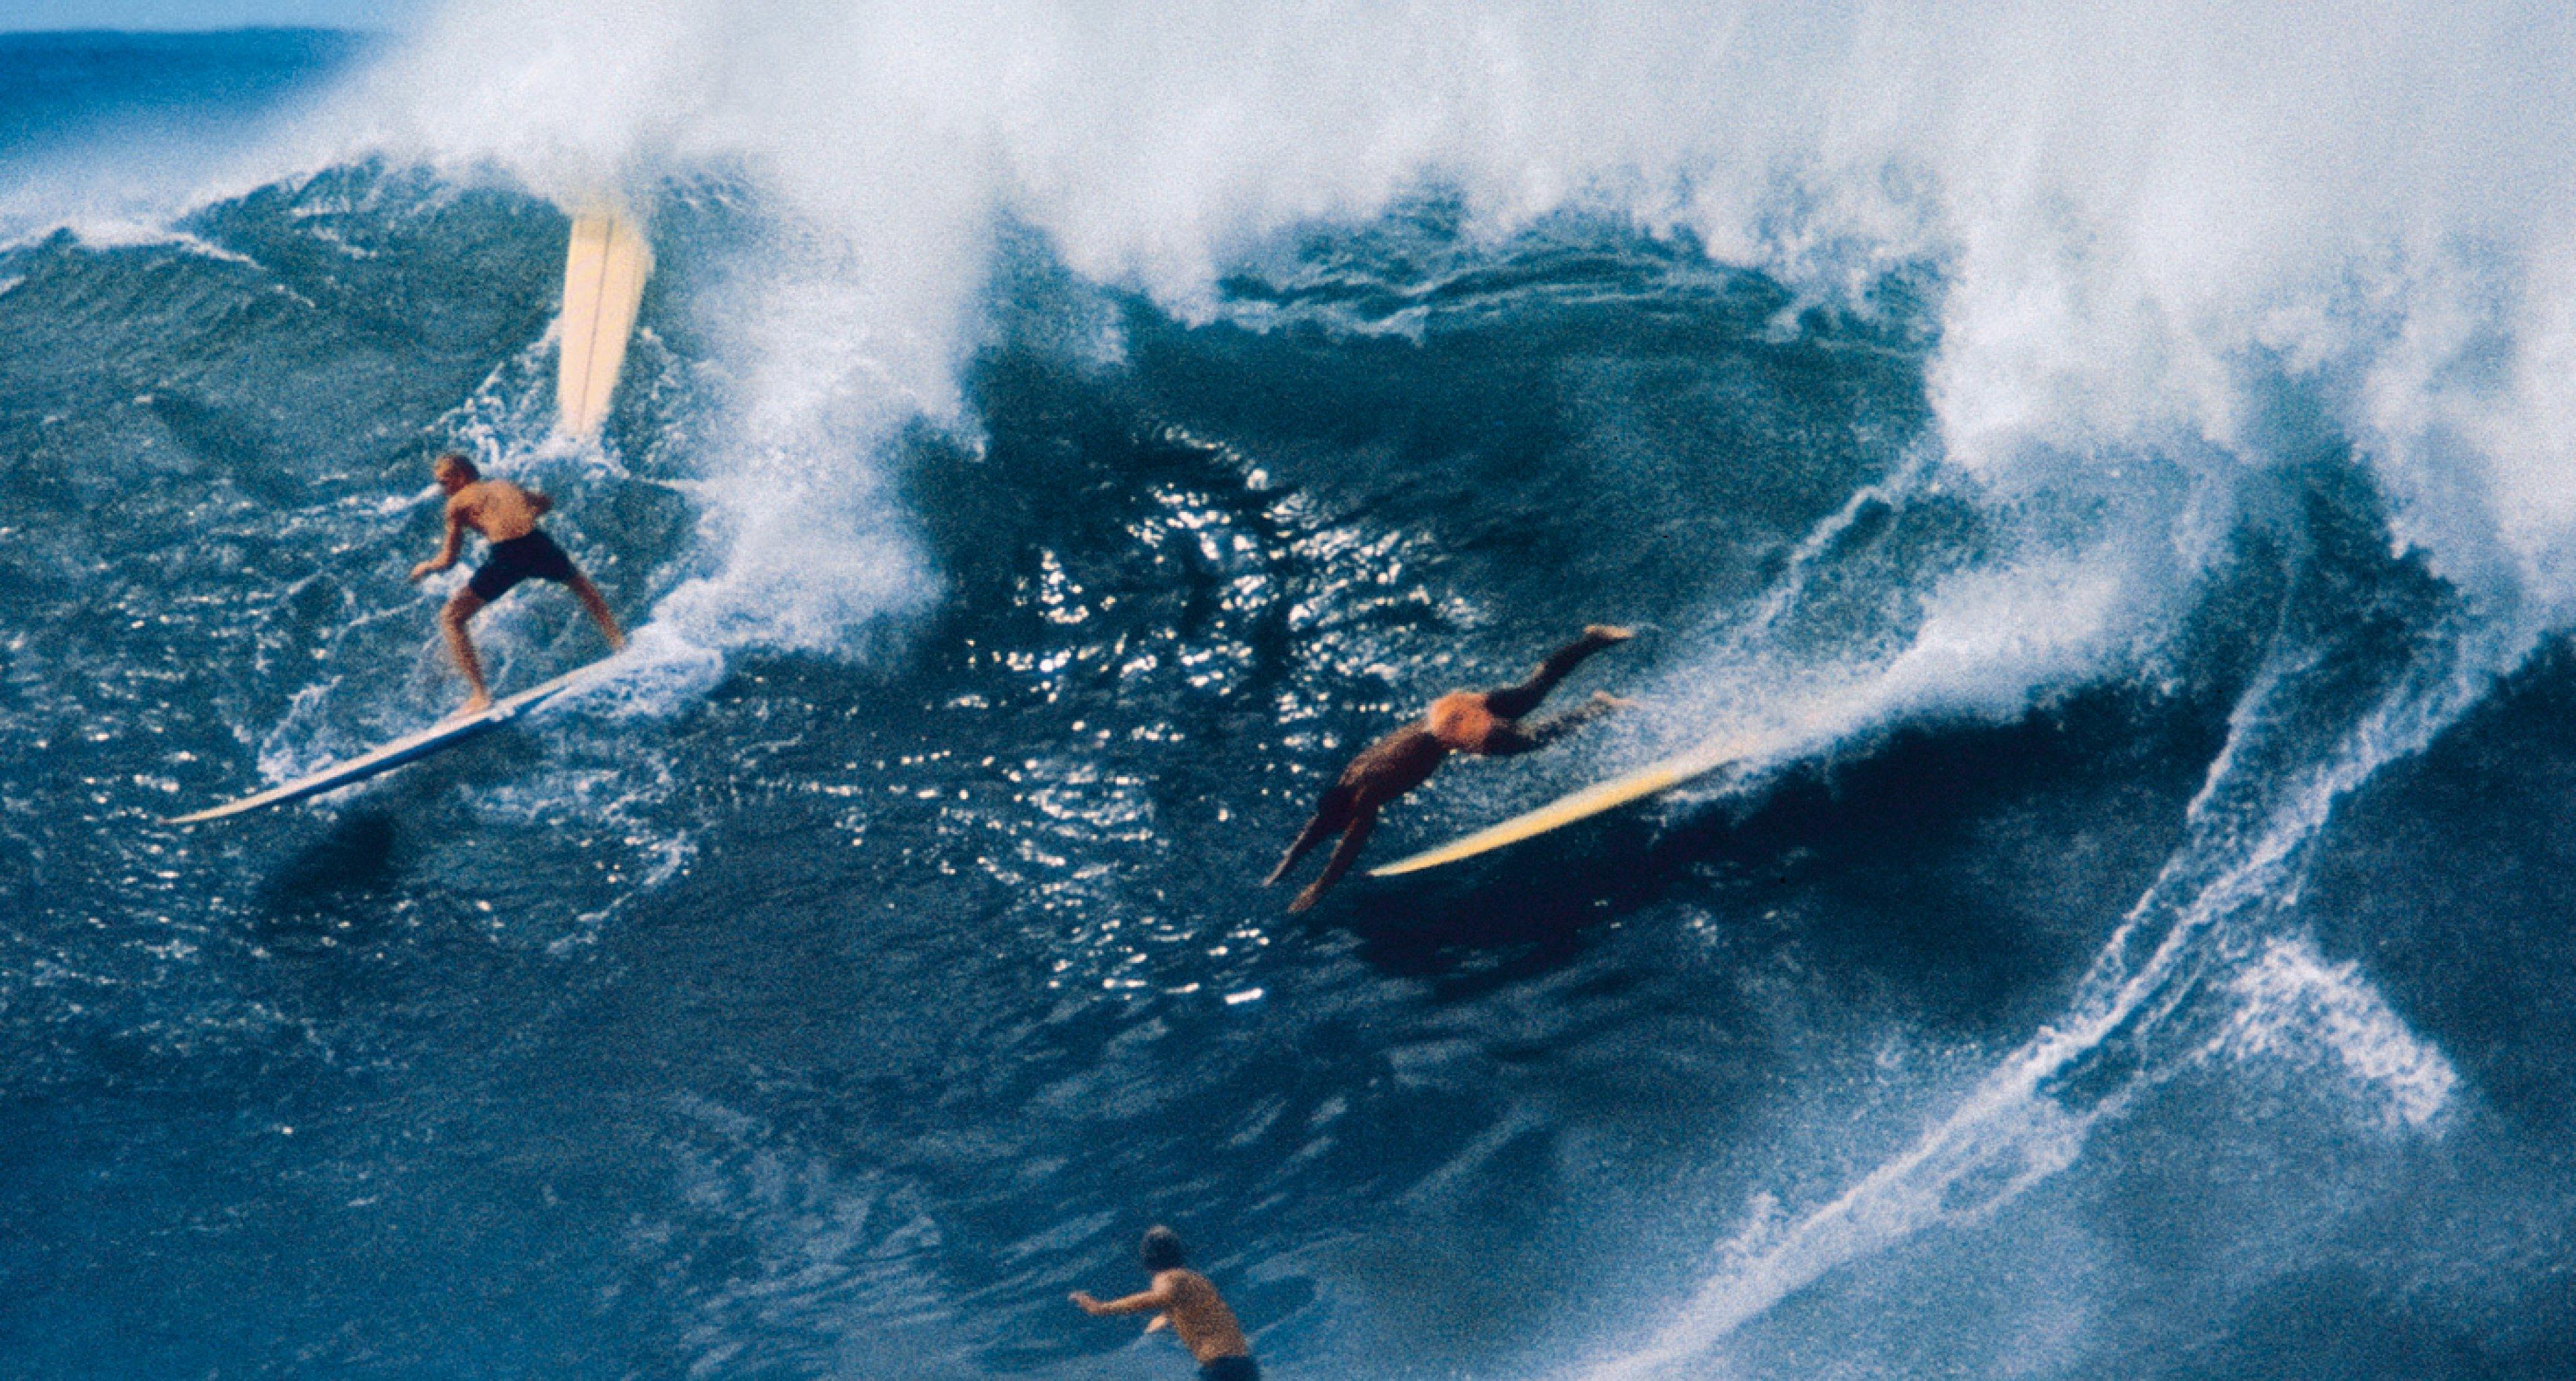 Waimea Bay, Hawaii, 1966. Copyright: LeRoy Grannis Collection / Courtesy TASCHEN